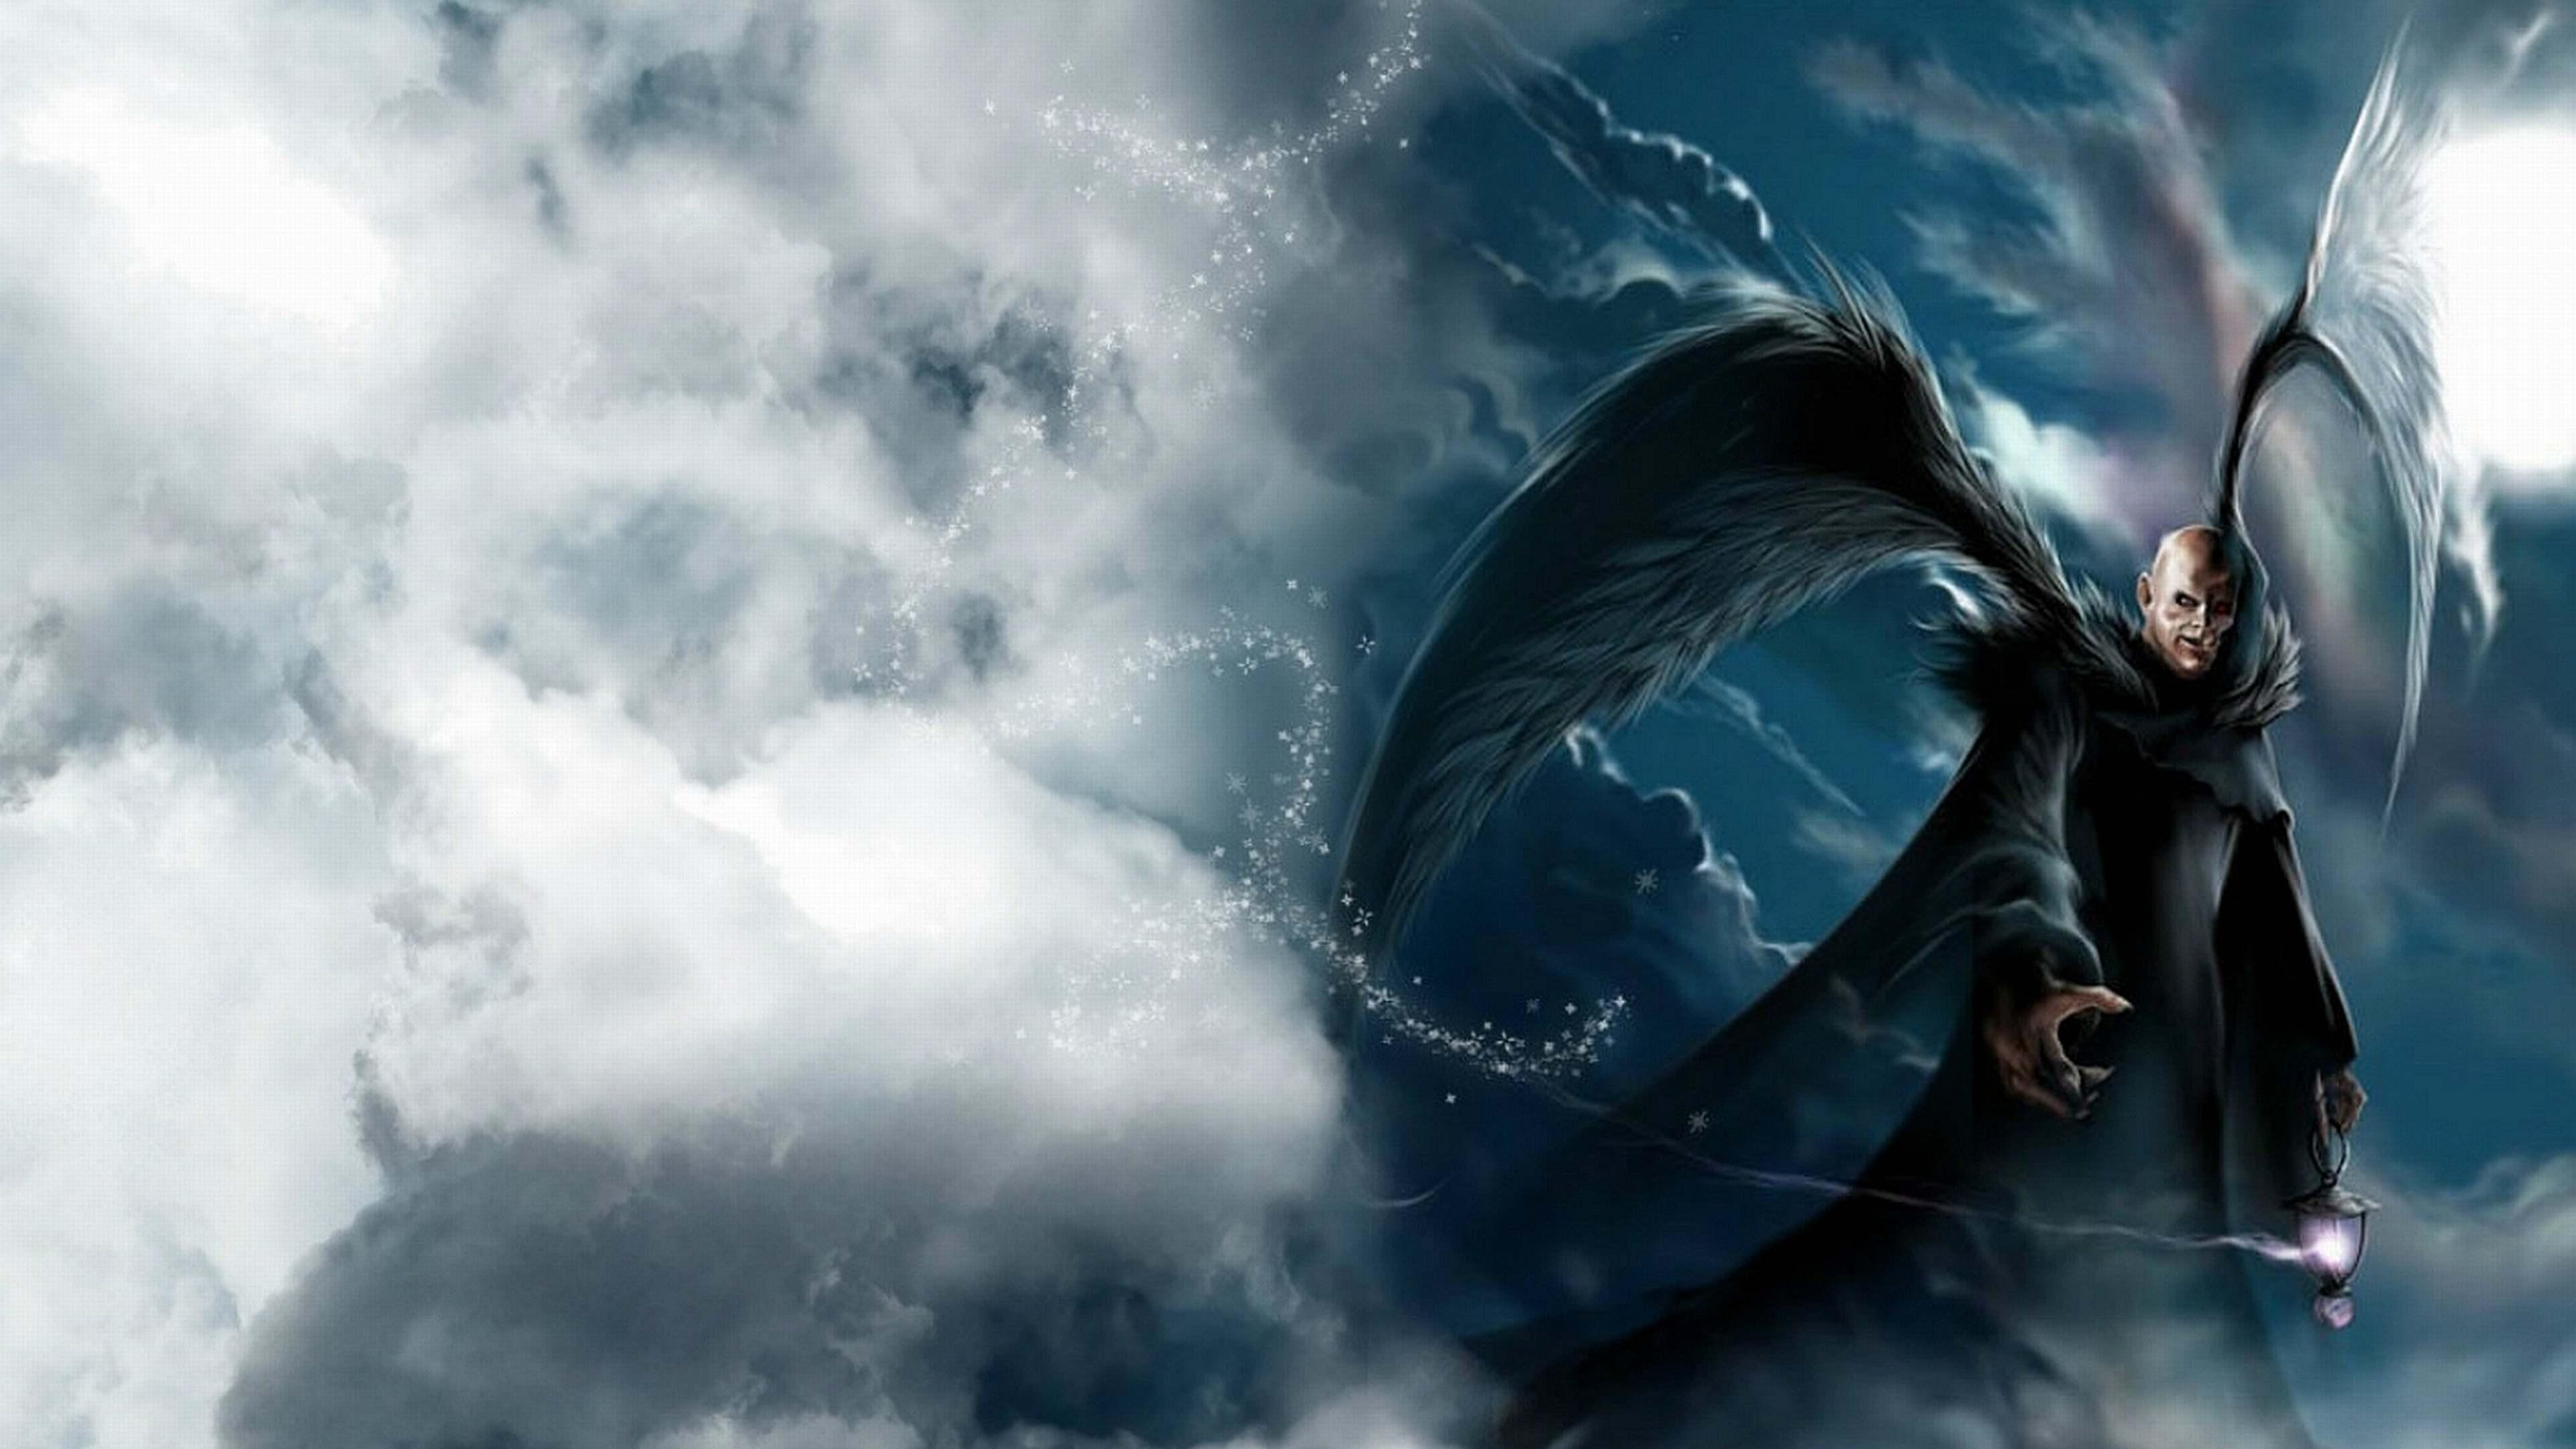 картинки на рабочий фон ангелов часто